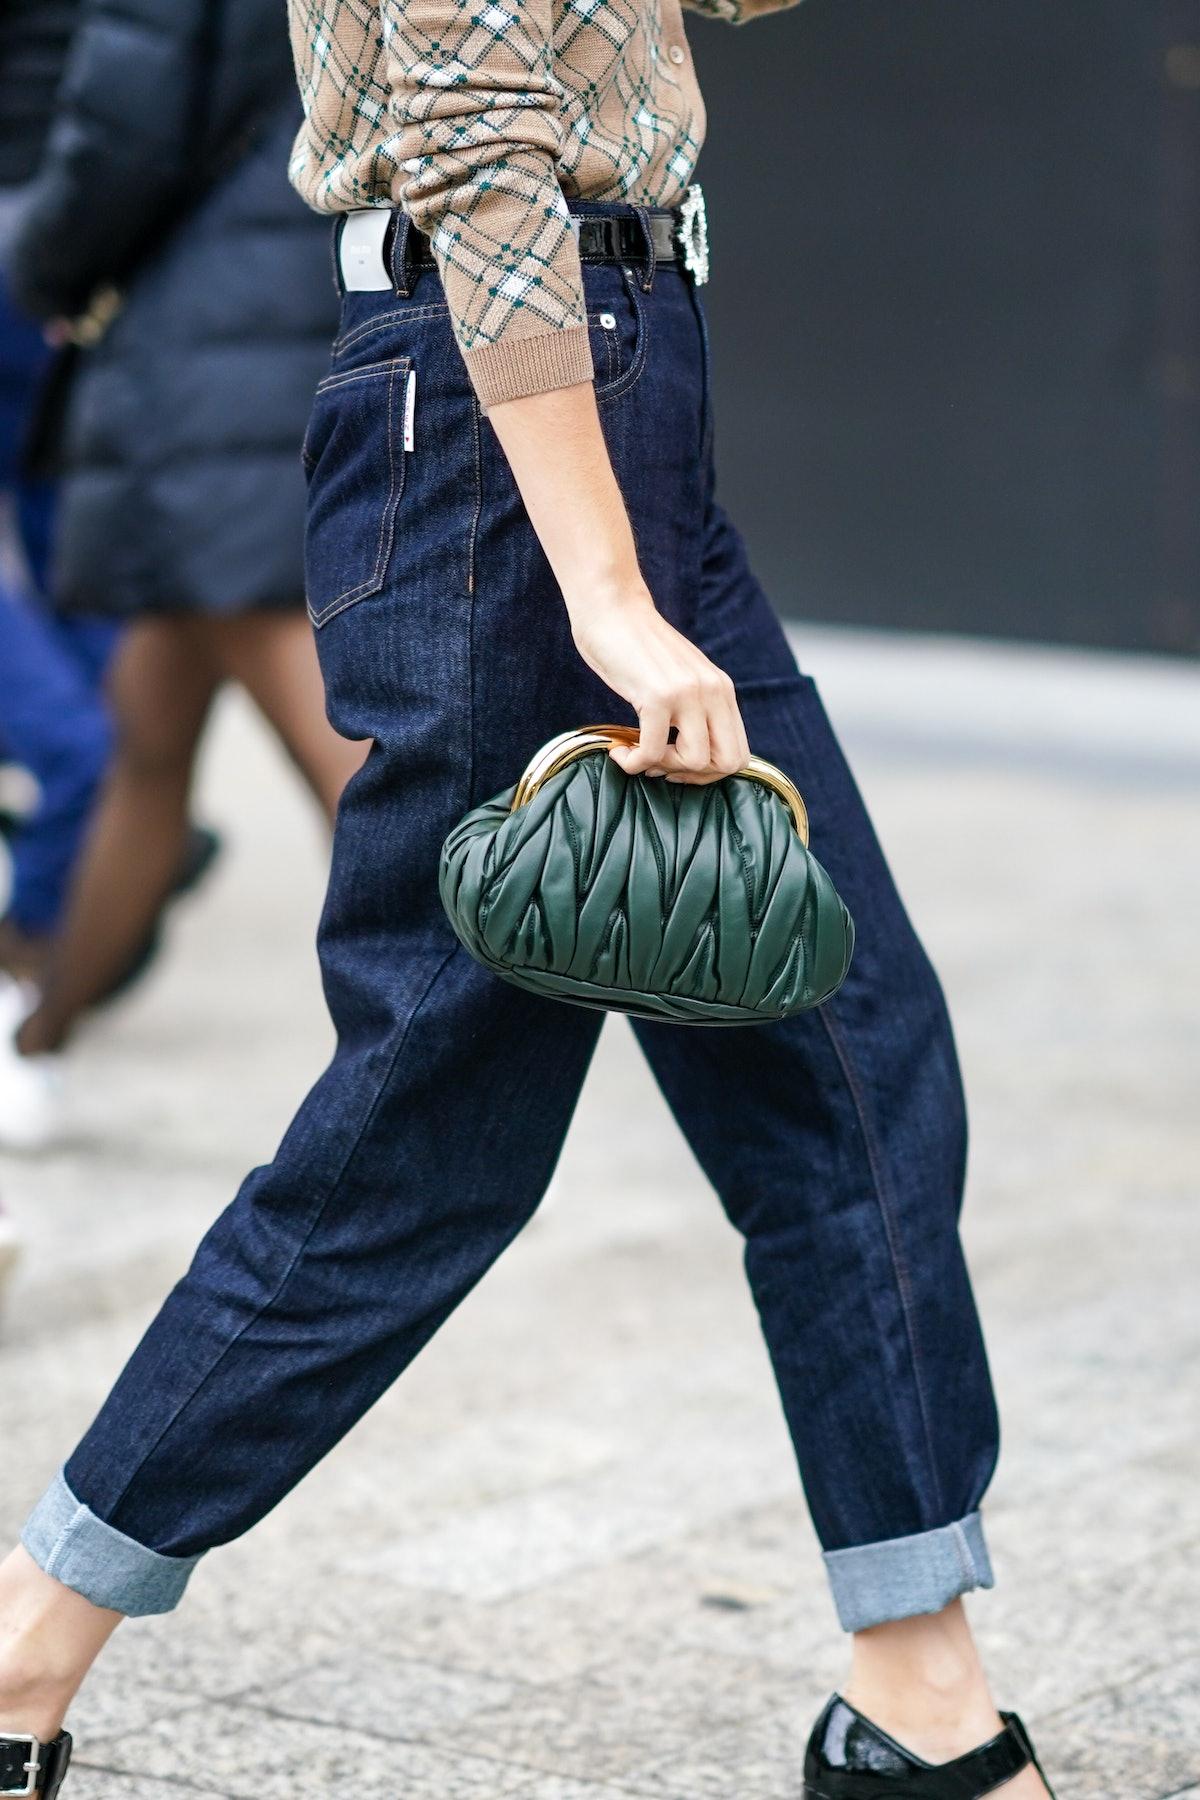 PARIS, FRANCE - OCTOBER 06: A guest wears a green woven leather Miu Miu bag, blue hem jeans, outside...